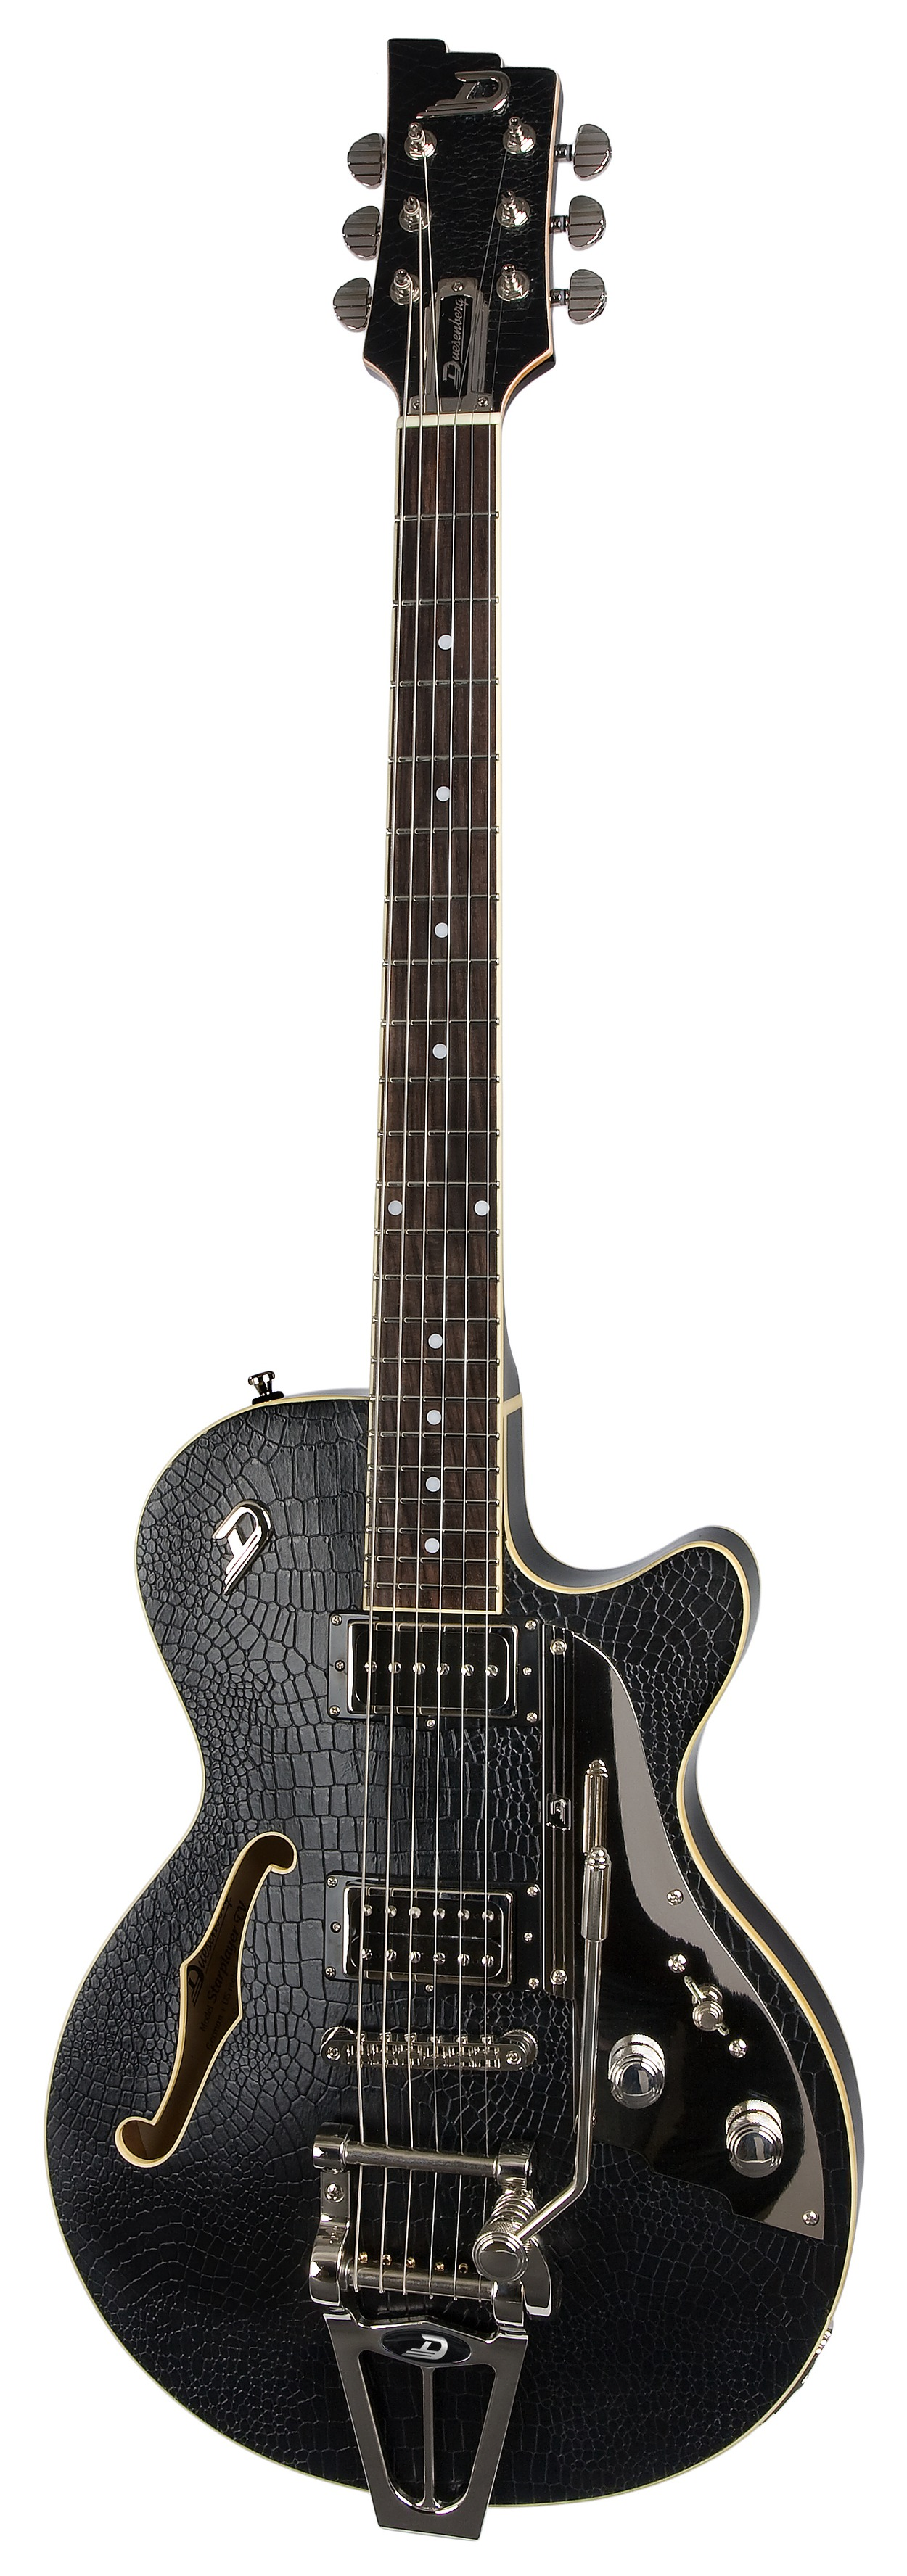 duesenberg starplayer tv outlaw 2016 guitar for sale headbanger rare guitar. Black Bedroom Furniture Sets. Home Design Ideas